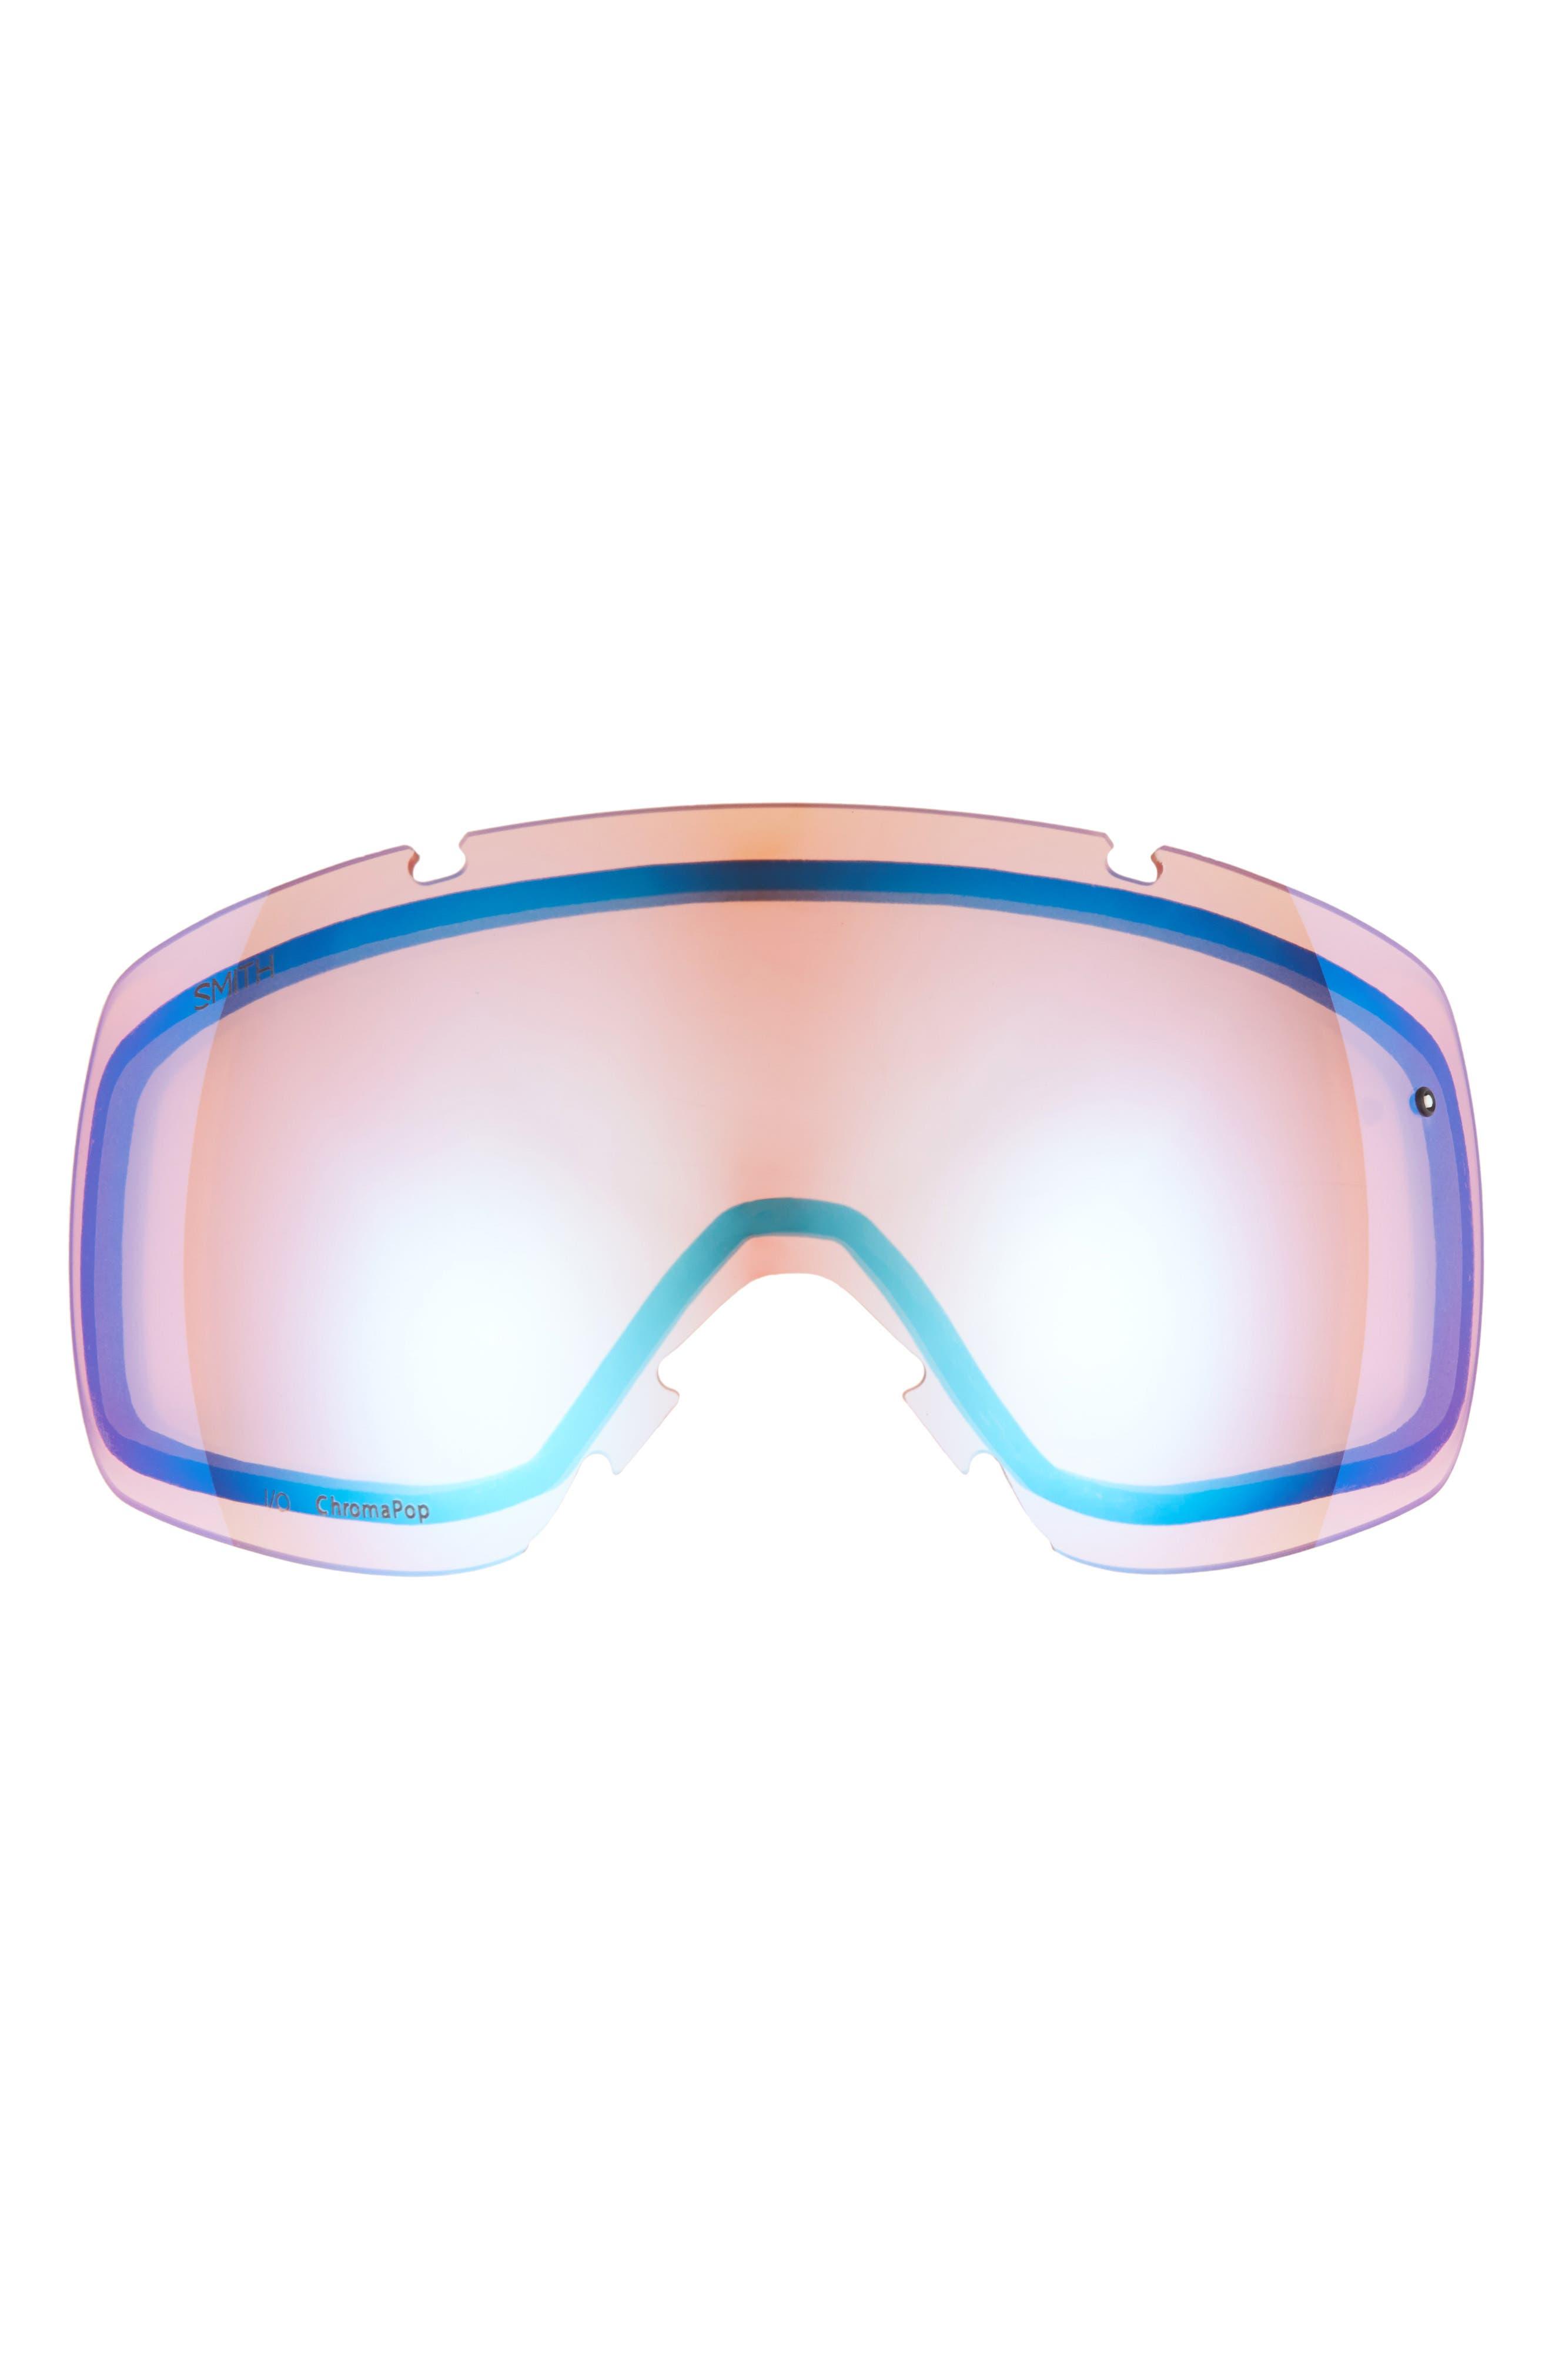 I/O 180mm Snow/Ski Goggles,                             Alternate thumbnail 2, color,                             Patina Split/ Mirror